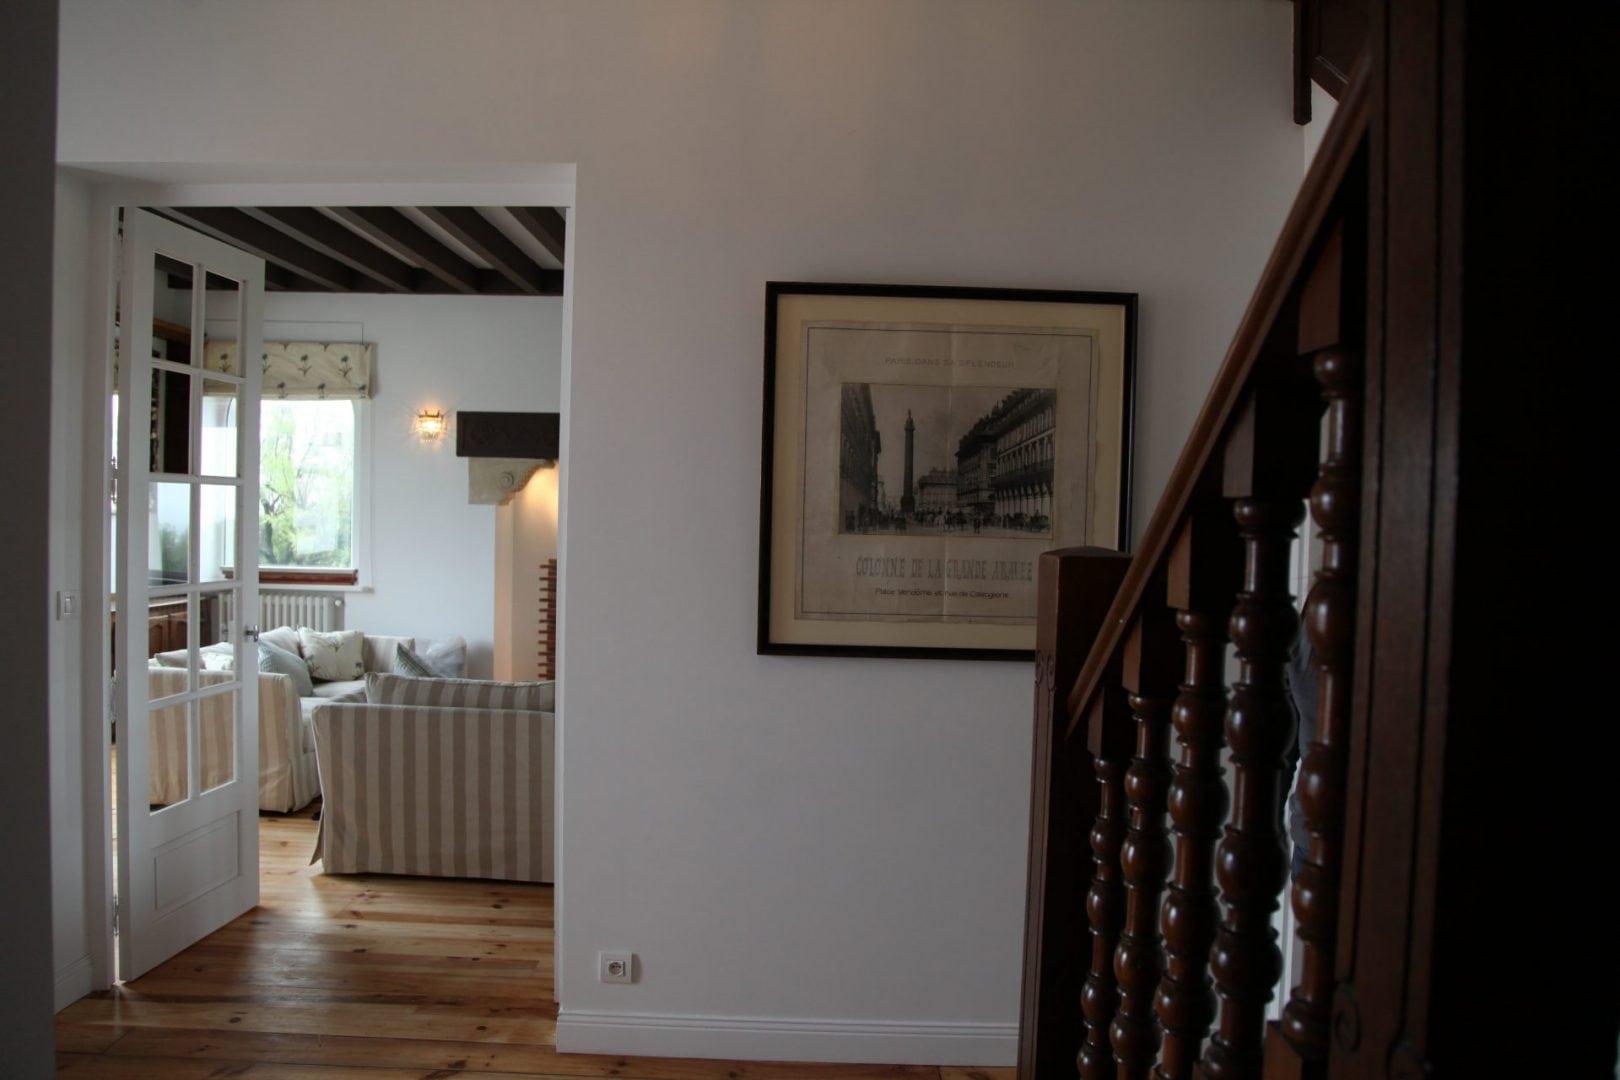 Biarritz beach house, sleeps 12, private pool, chef